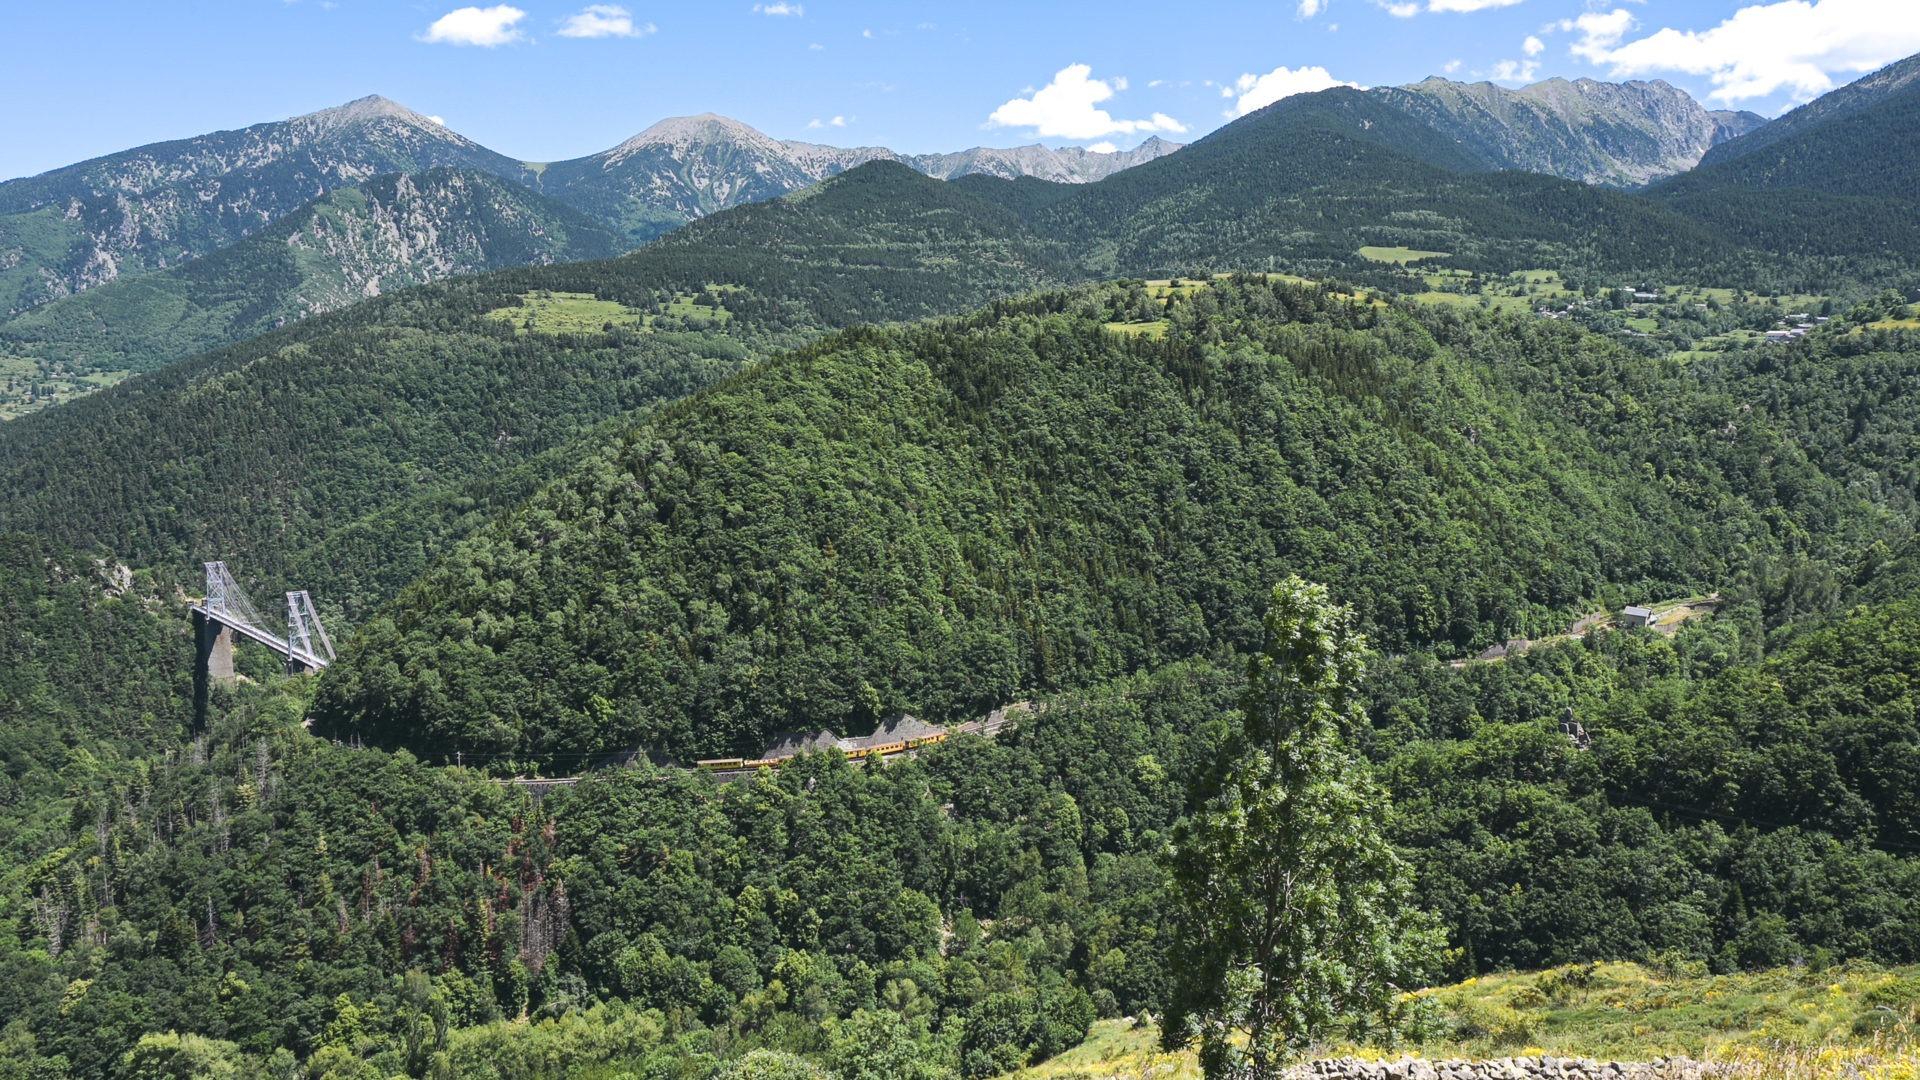 PNR pyrenees catalanes 6559